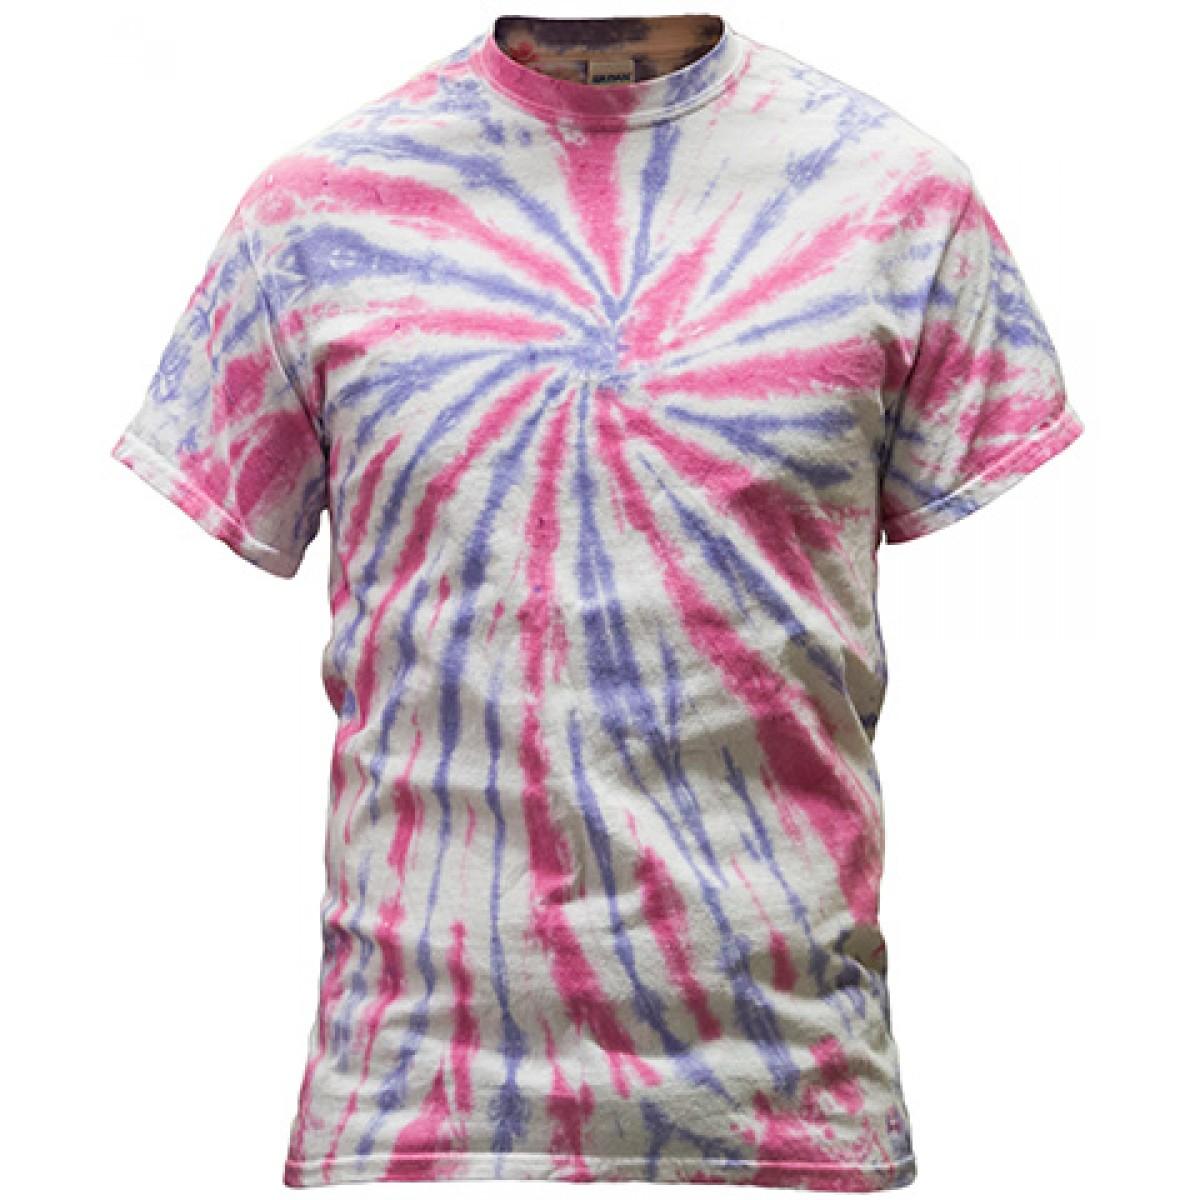 Multi-Color Tie-Dye Tee -Pink/Purple-3XL